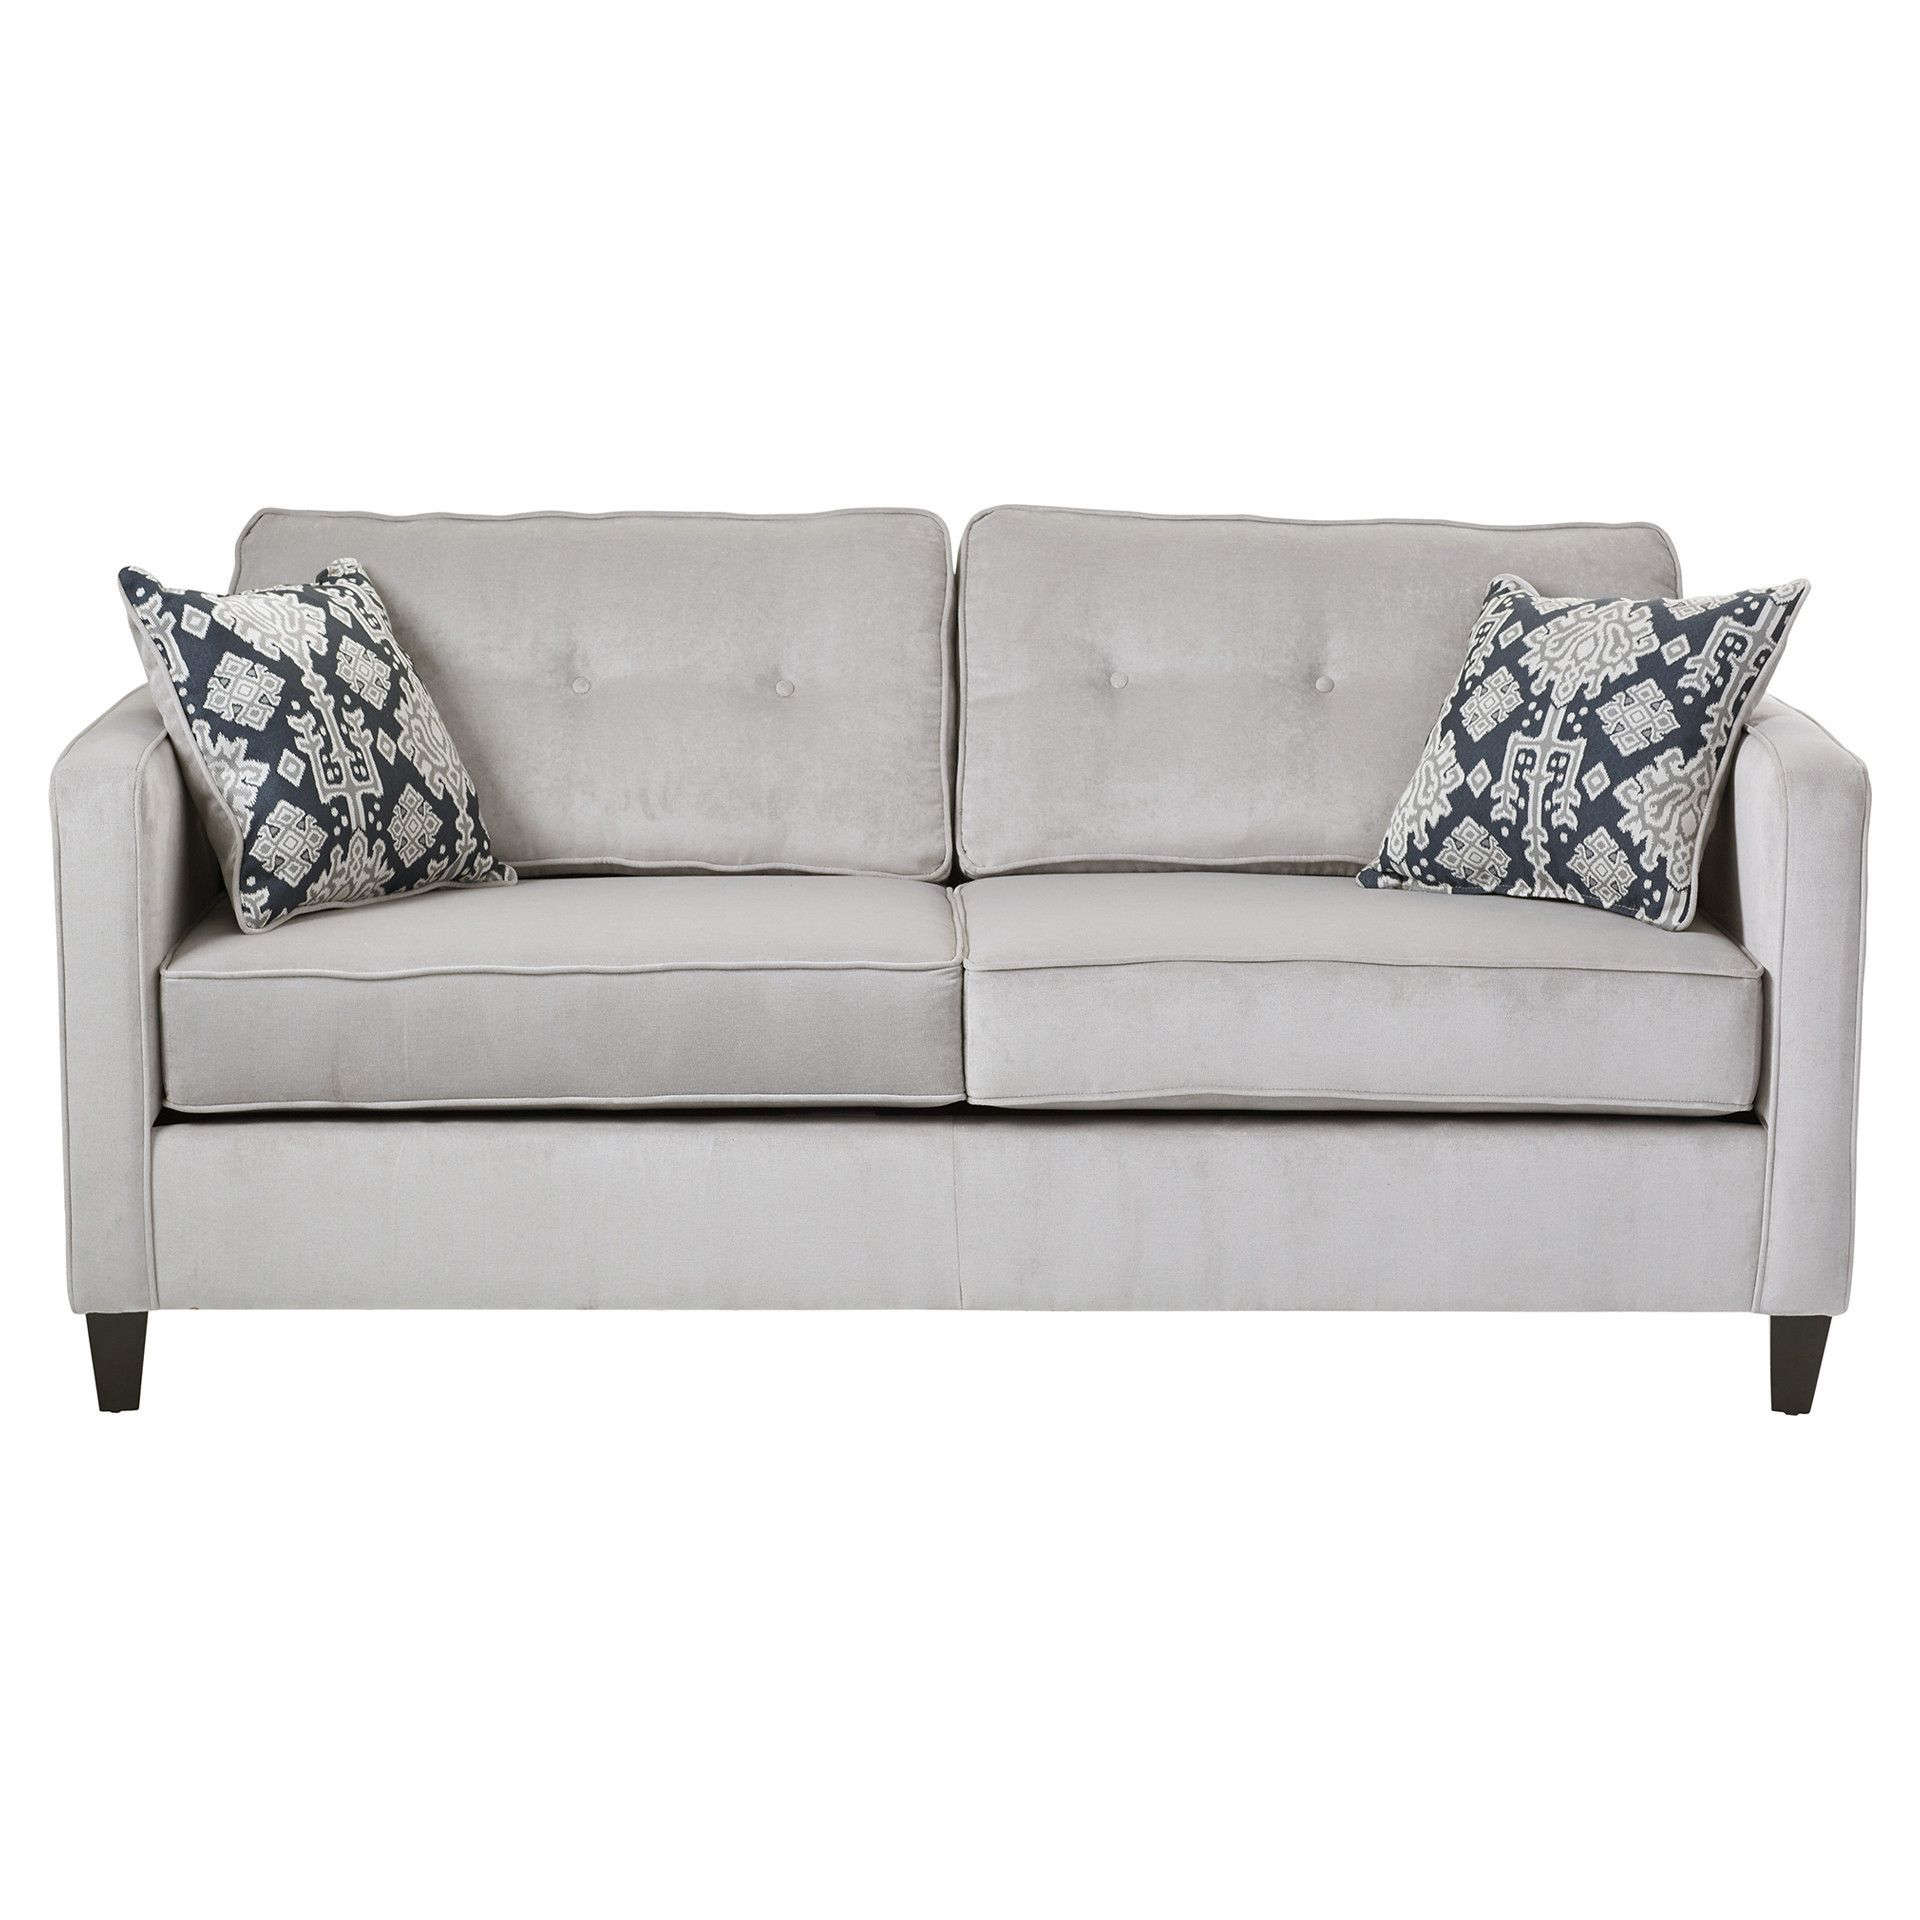 serta upholstery leda sofa upholstery and products